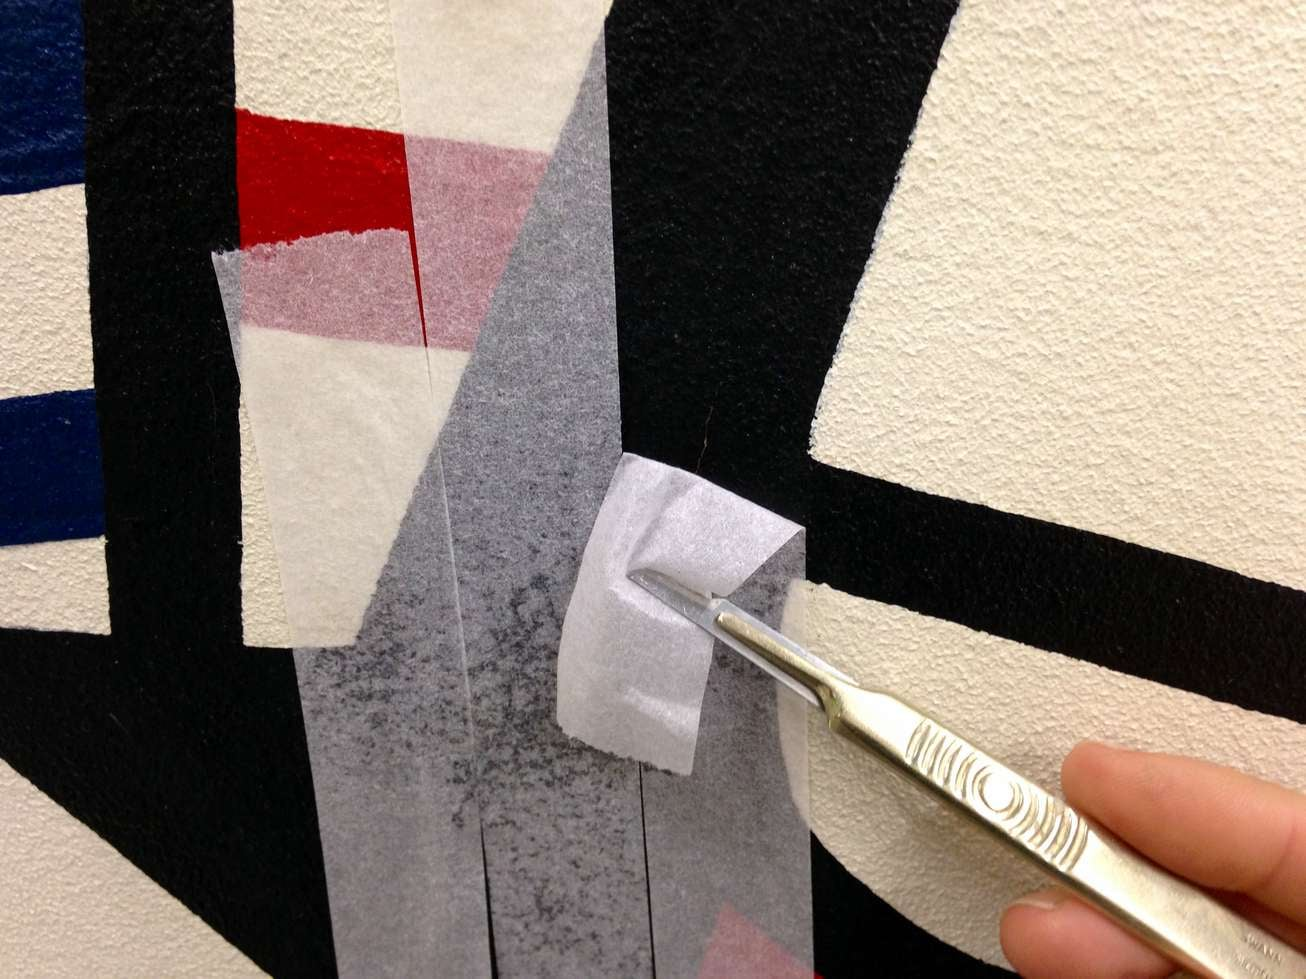 jean-dubuffet-oeuvre-resine-1974-collage-renforcement-art-restauratio-reparation-restaurarte.jpg